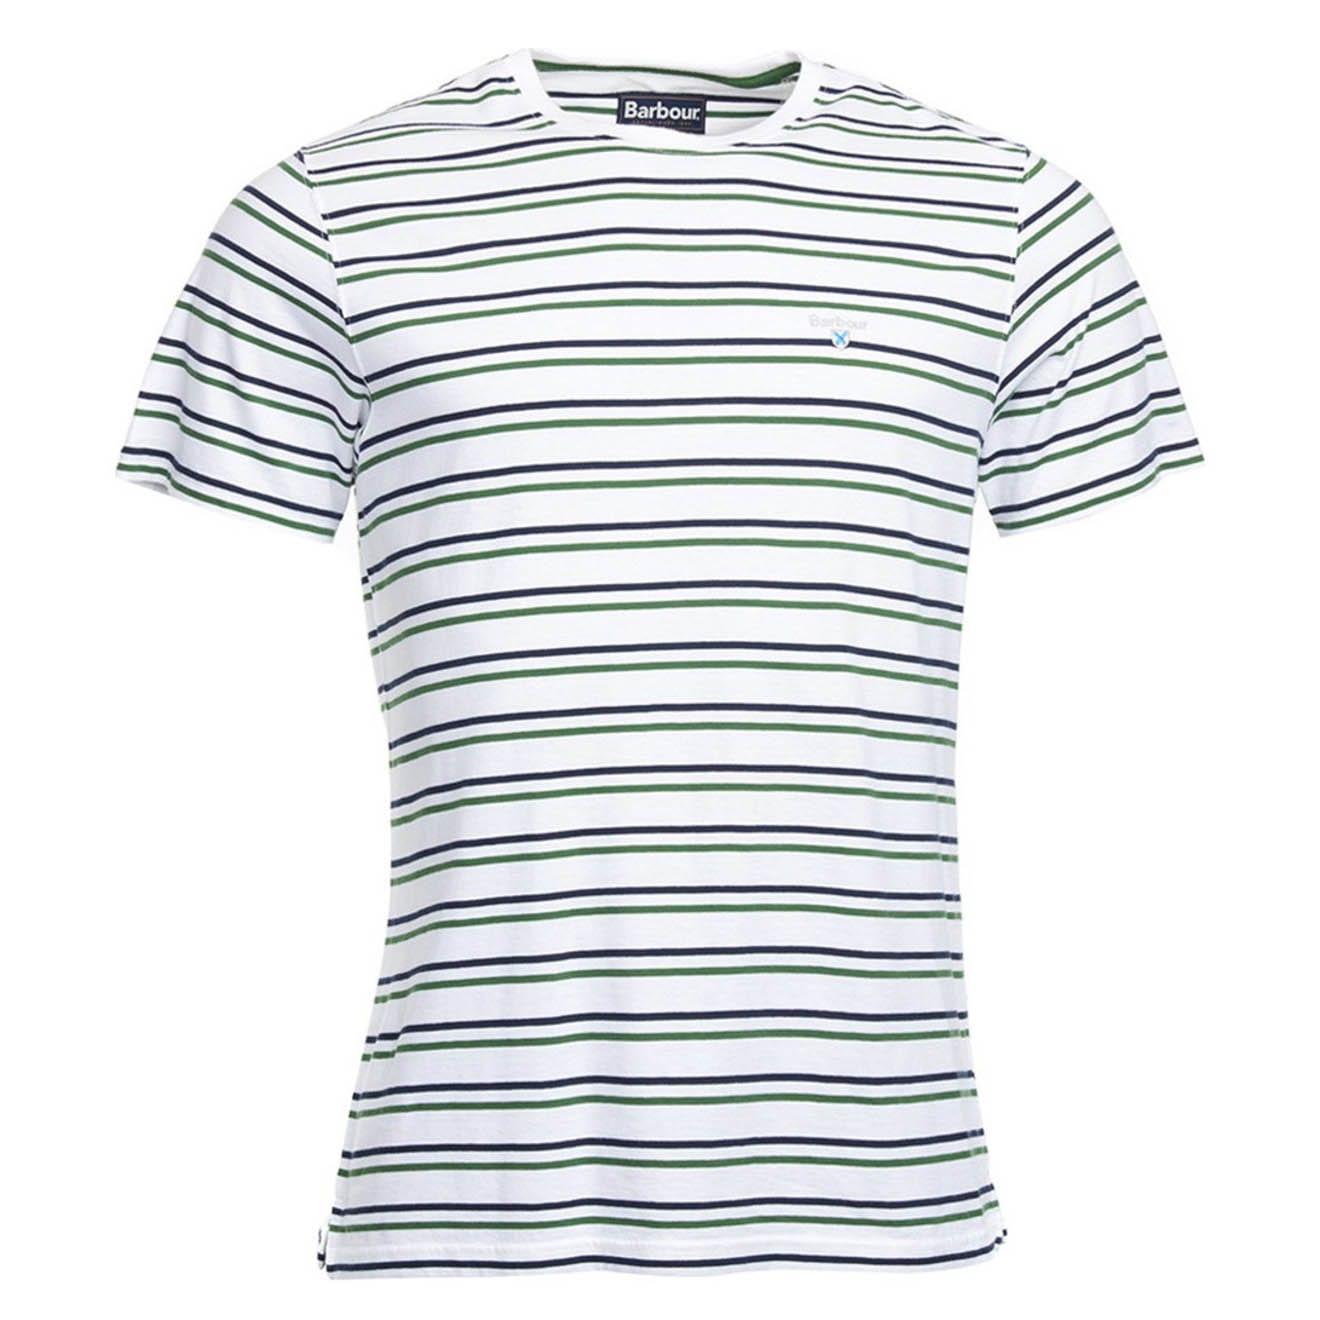 Barbour Duxford Stripe T-Shirt White